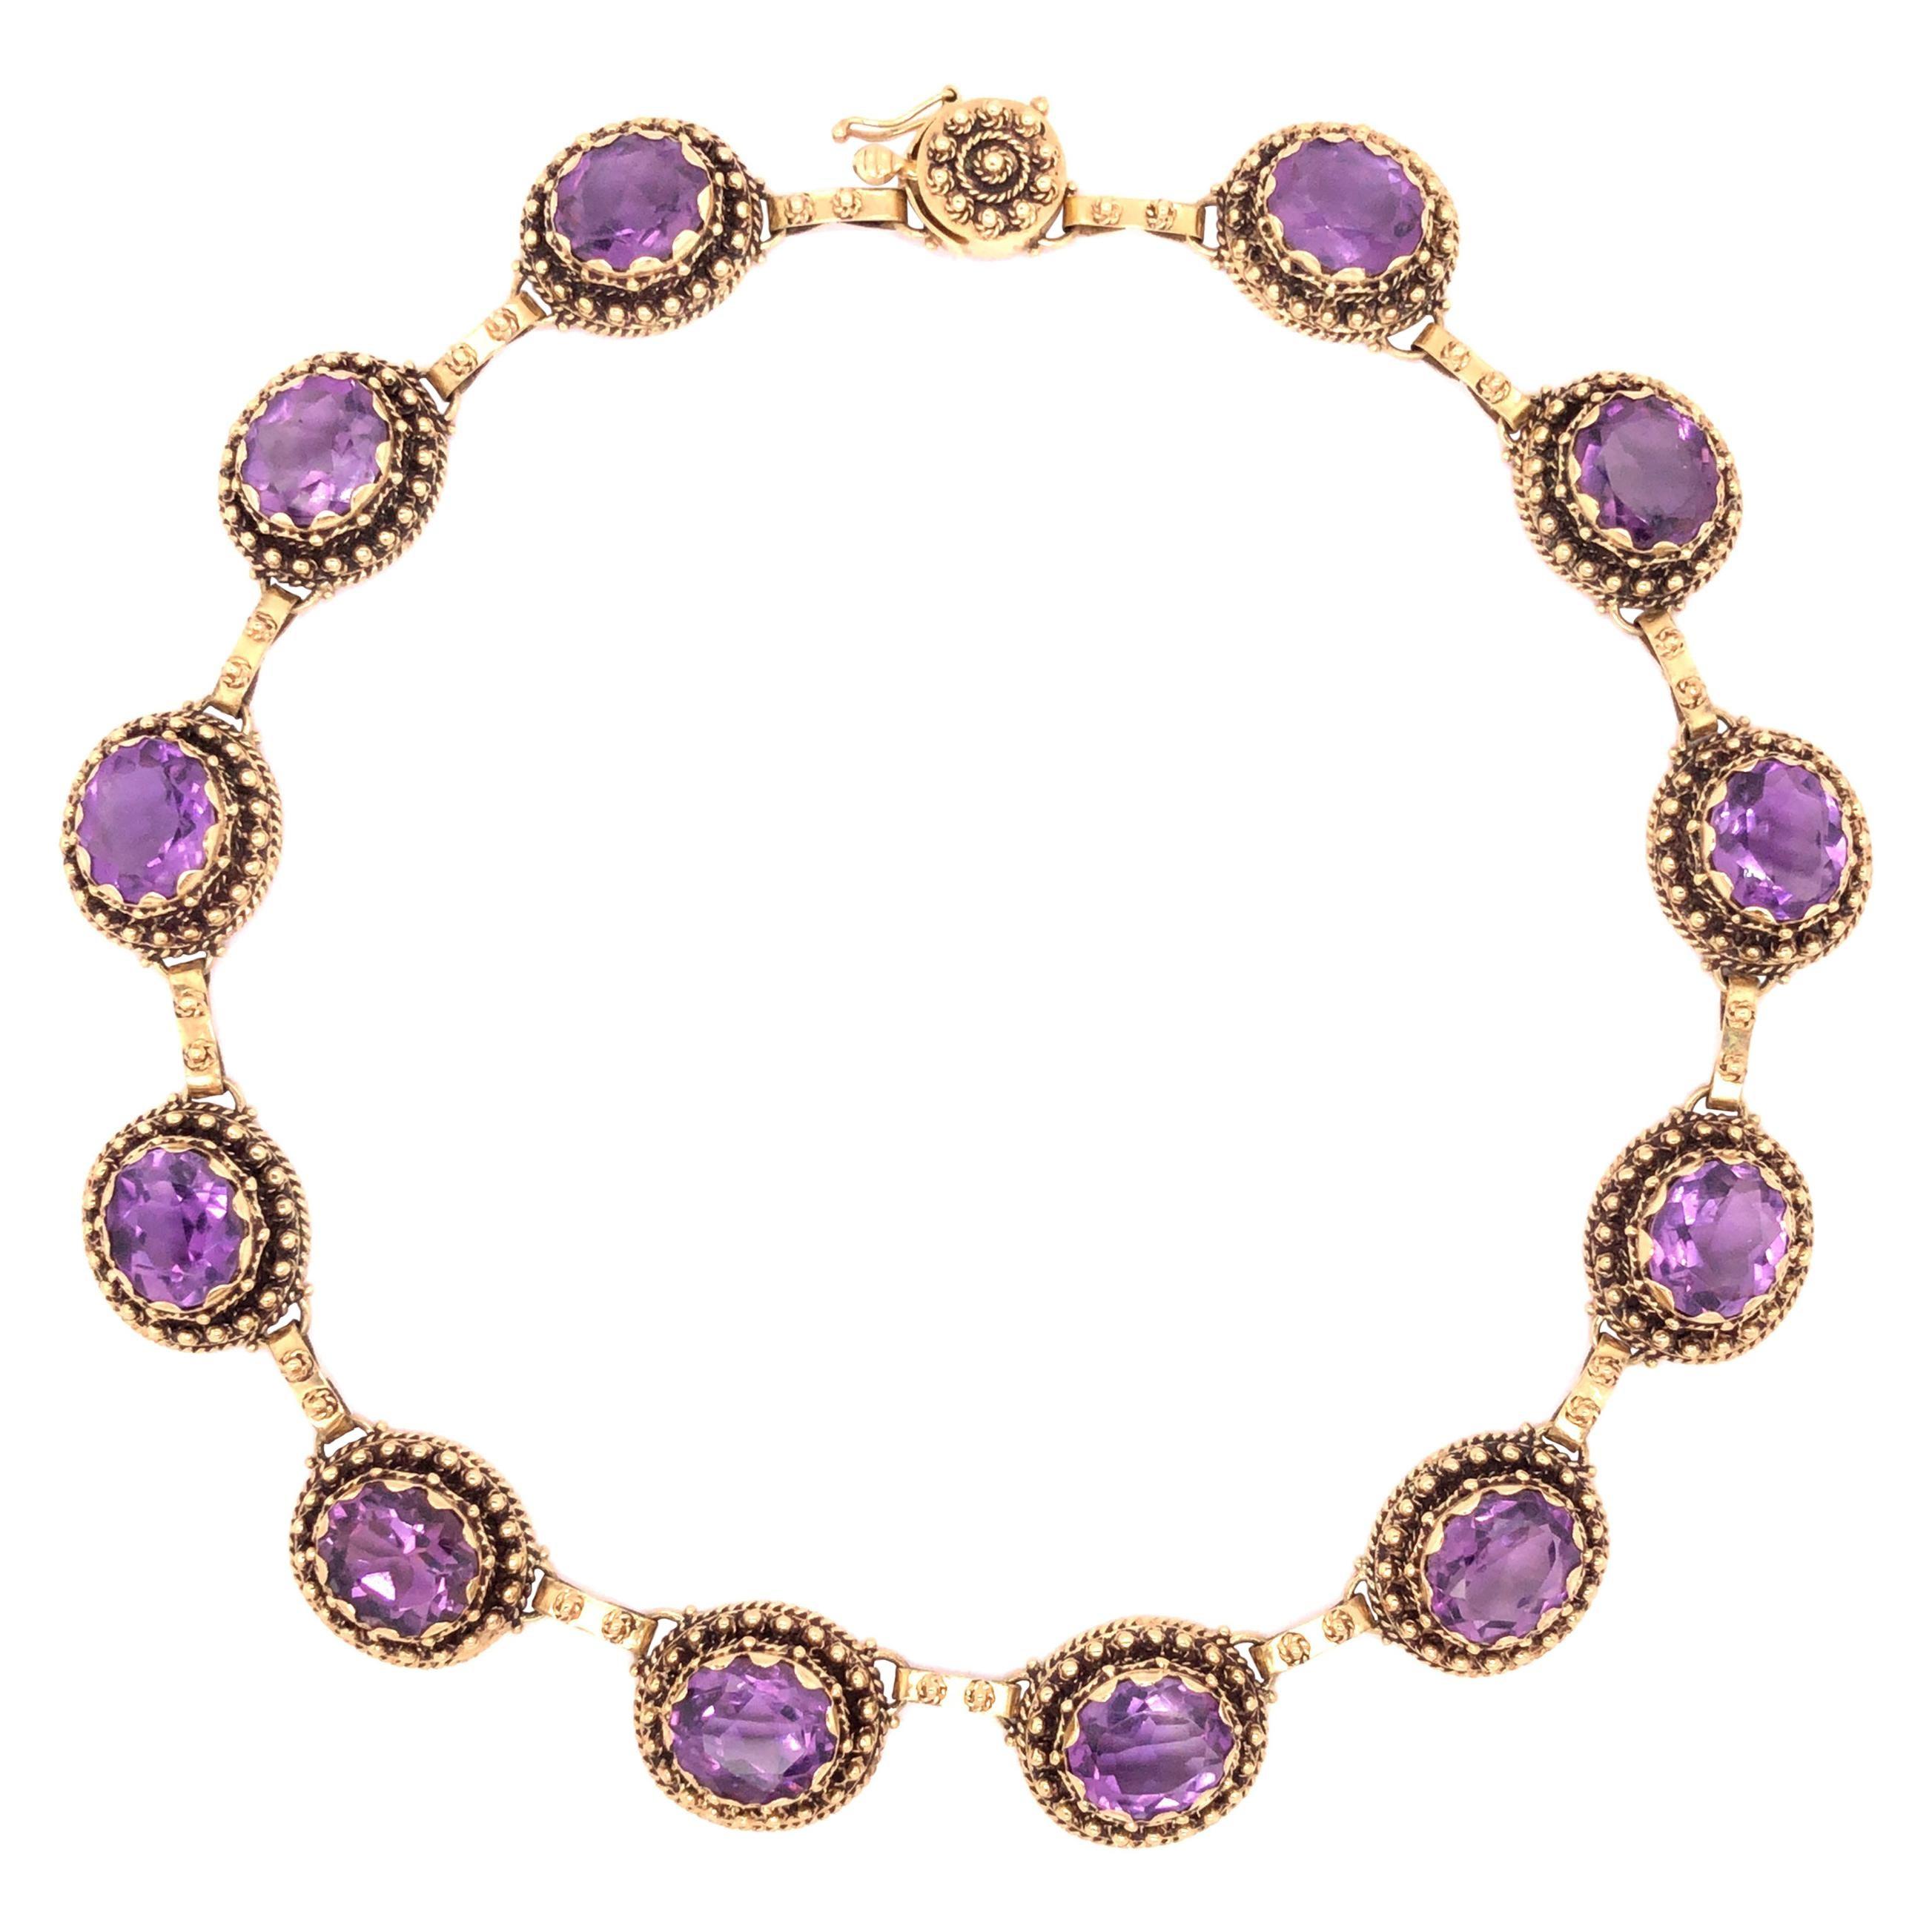 14 Karat Yellow Gold Amethyst Choker Necklace